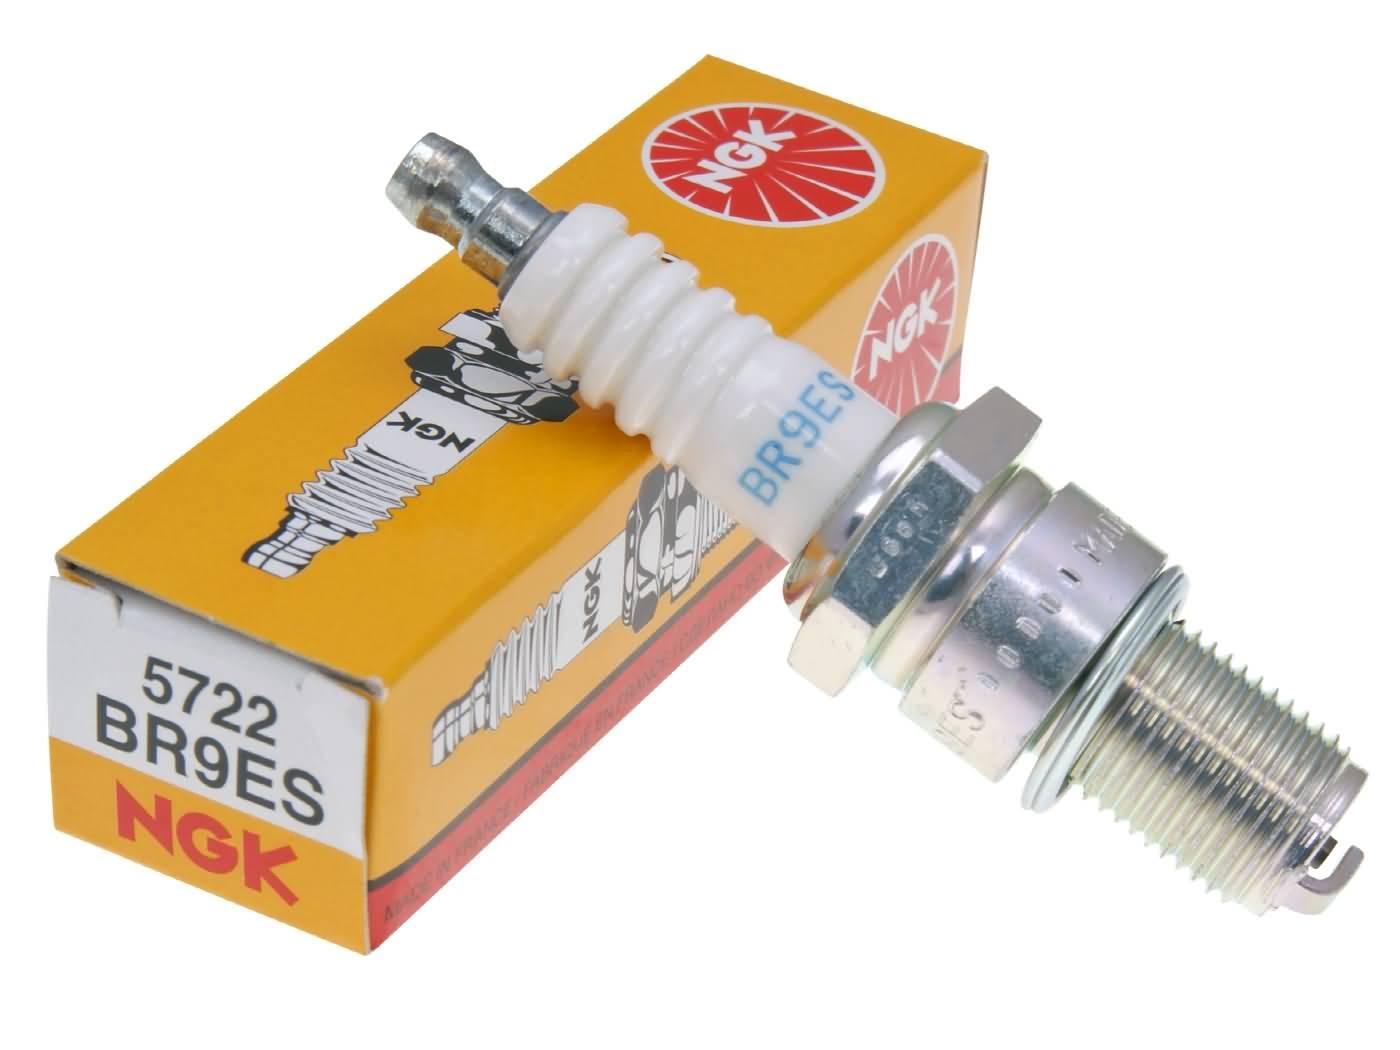 NGK Zündkerze Kerze Spark Plug BR9ES 5722-1 Stück